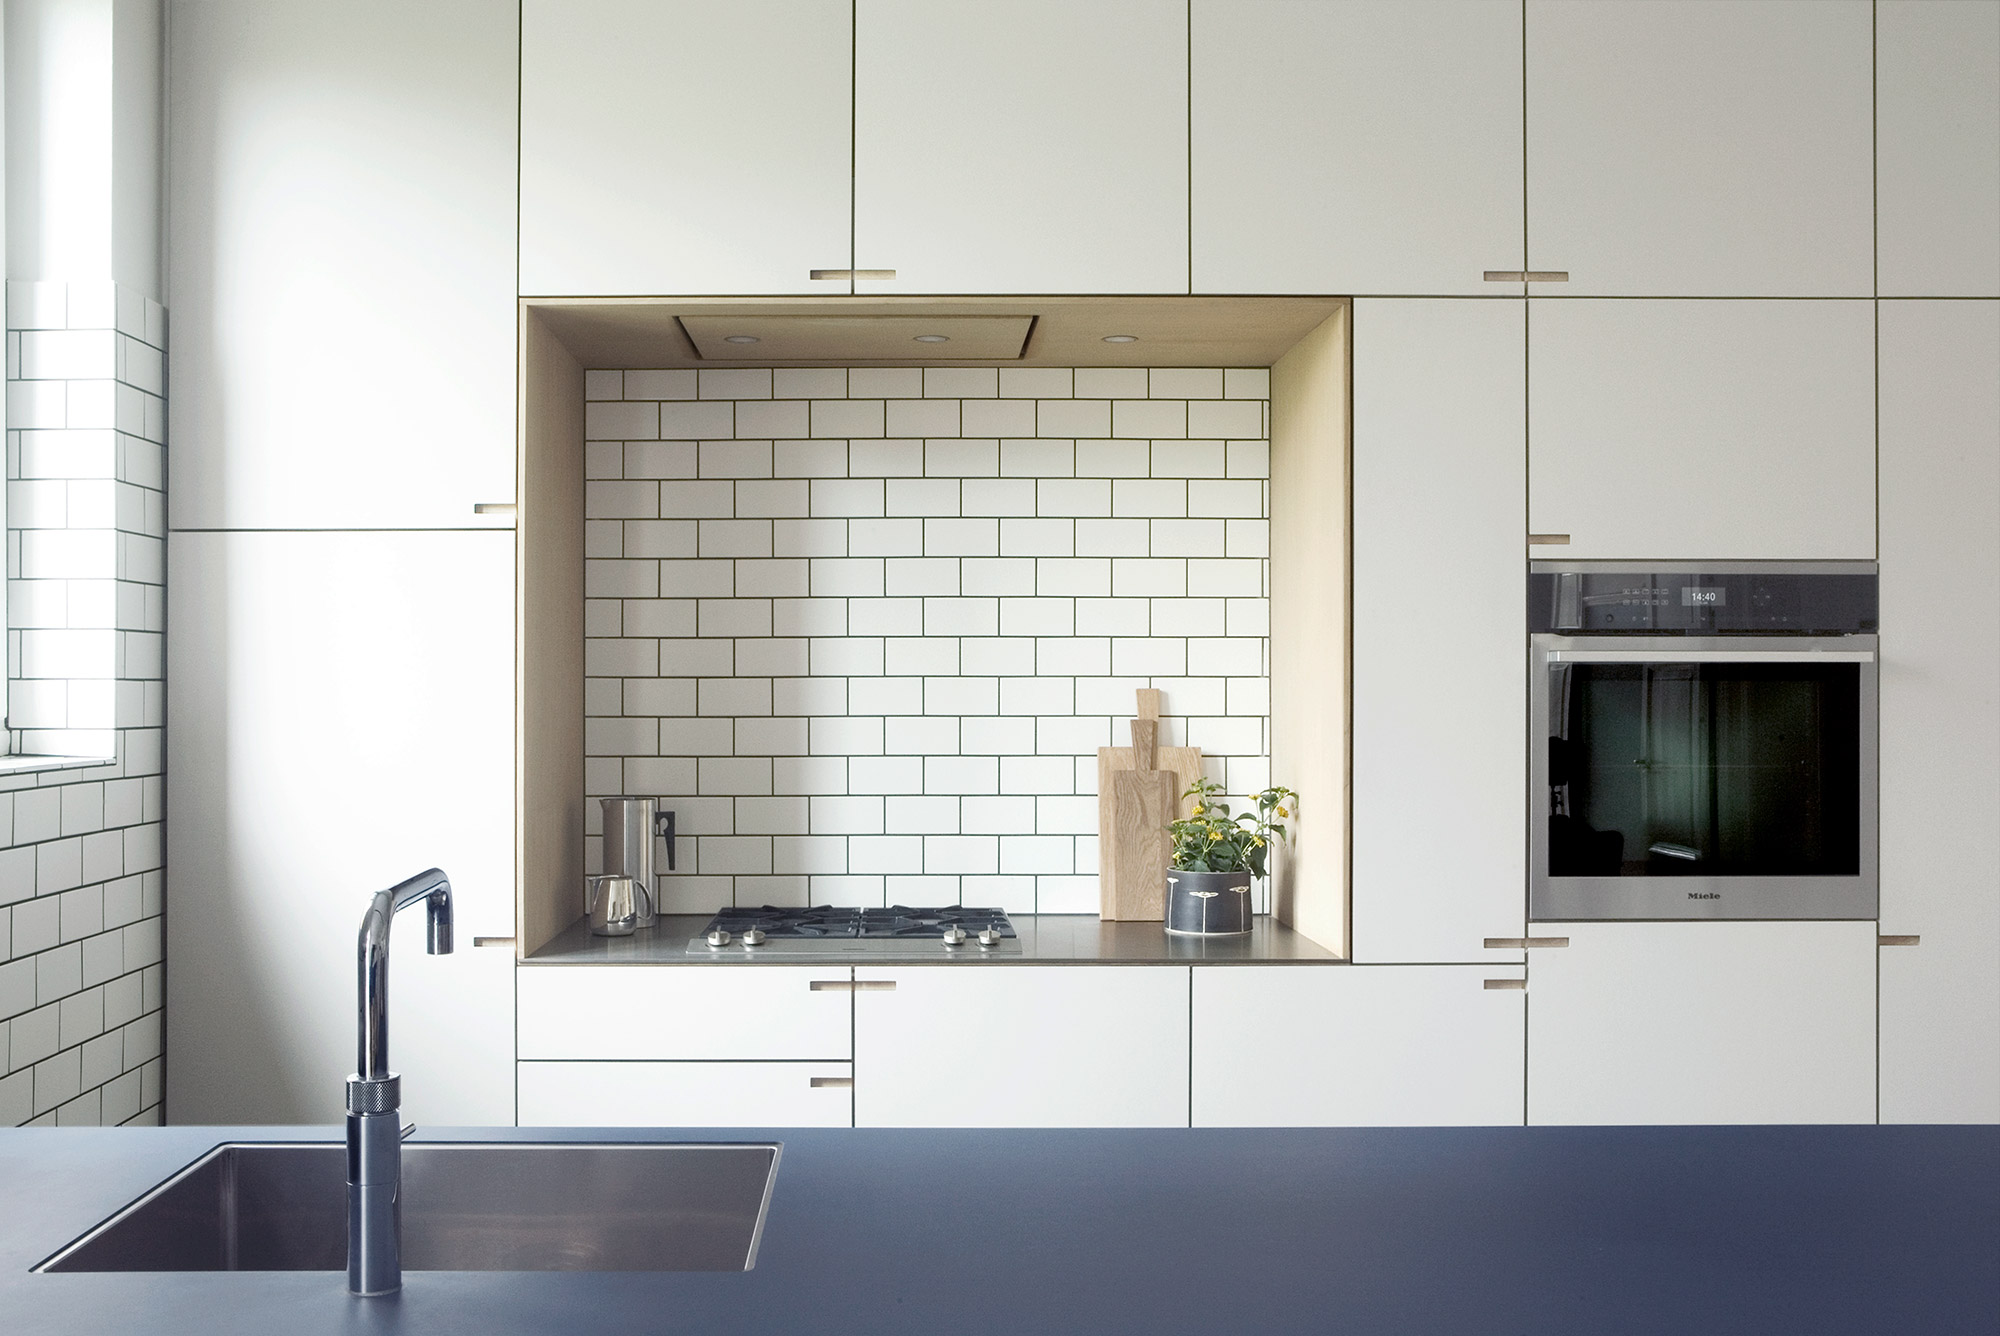 Bespoke oak wood kitchen from Nicolaj Bo™, Copenhagen